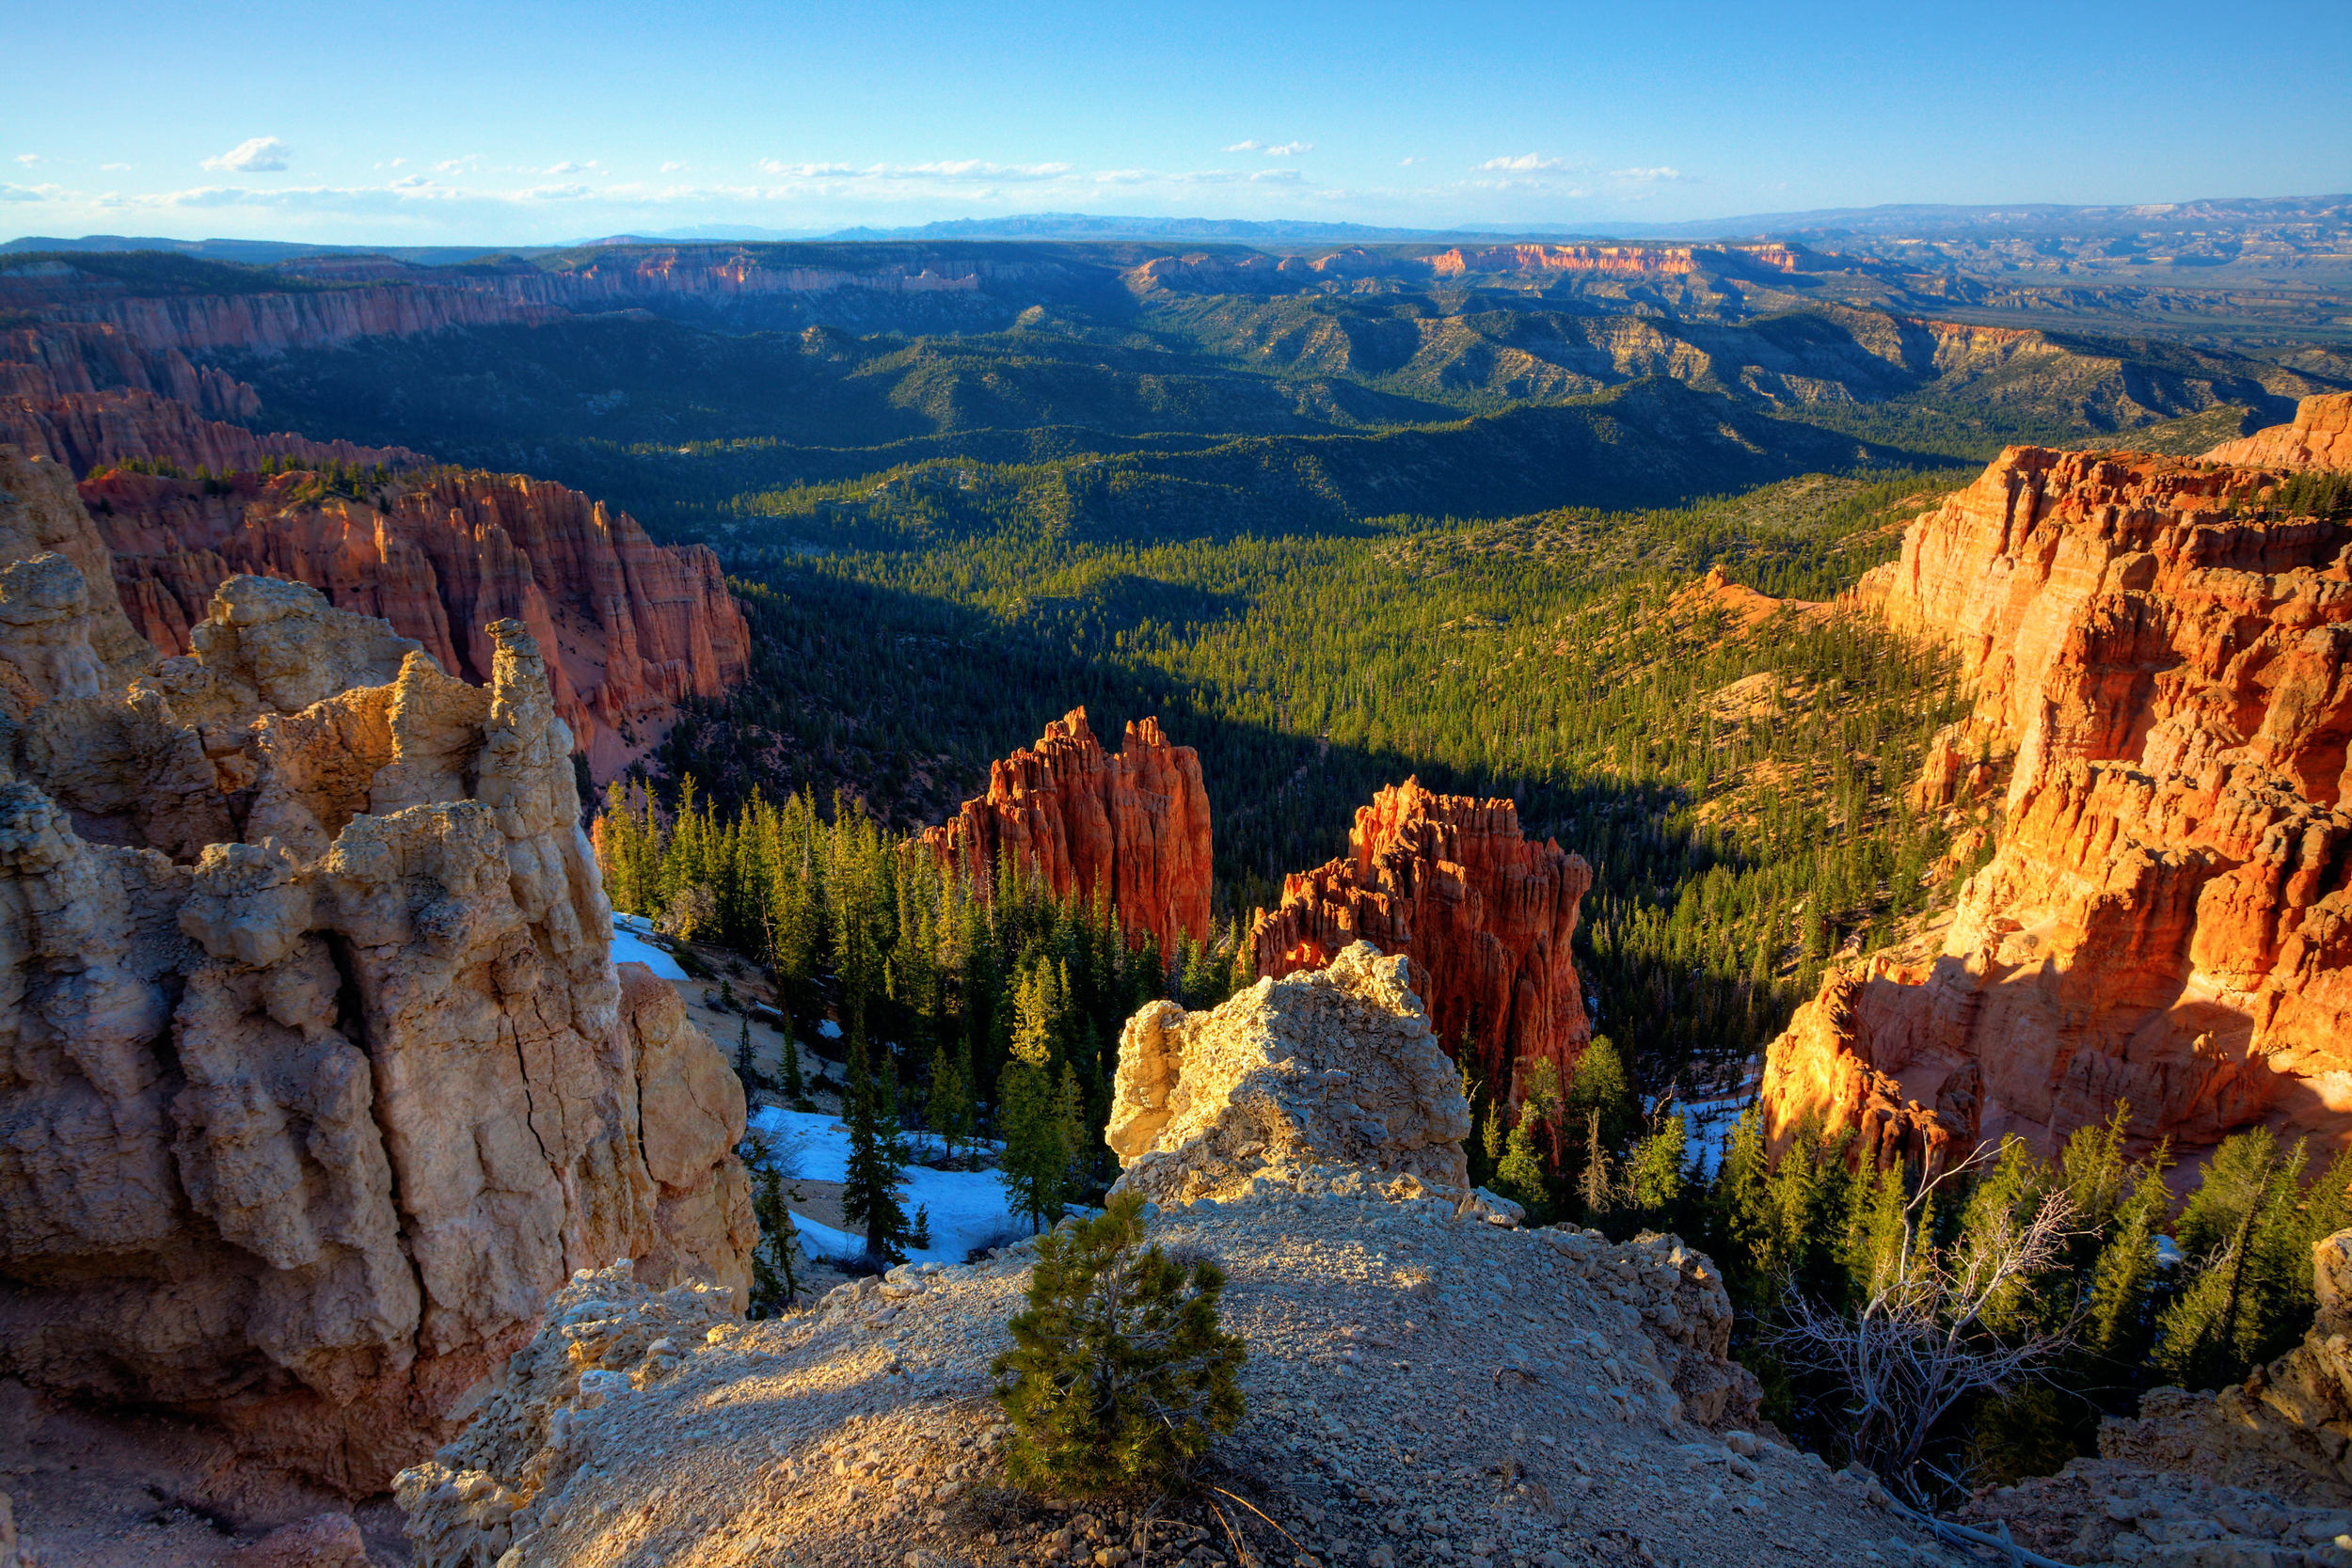 bryce canyon –(PHOTO: ALEXEY STIOP/SHUTTERSTOCK)